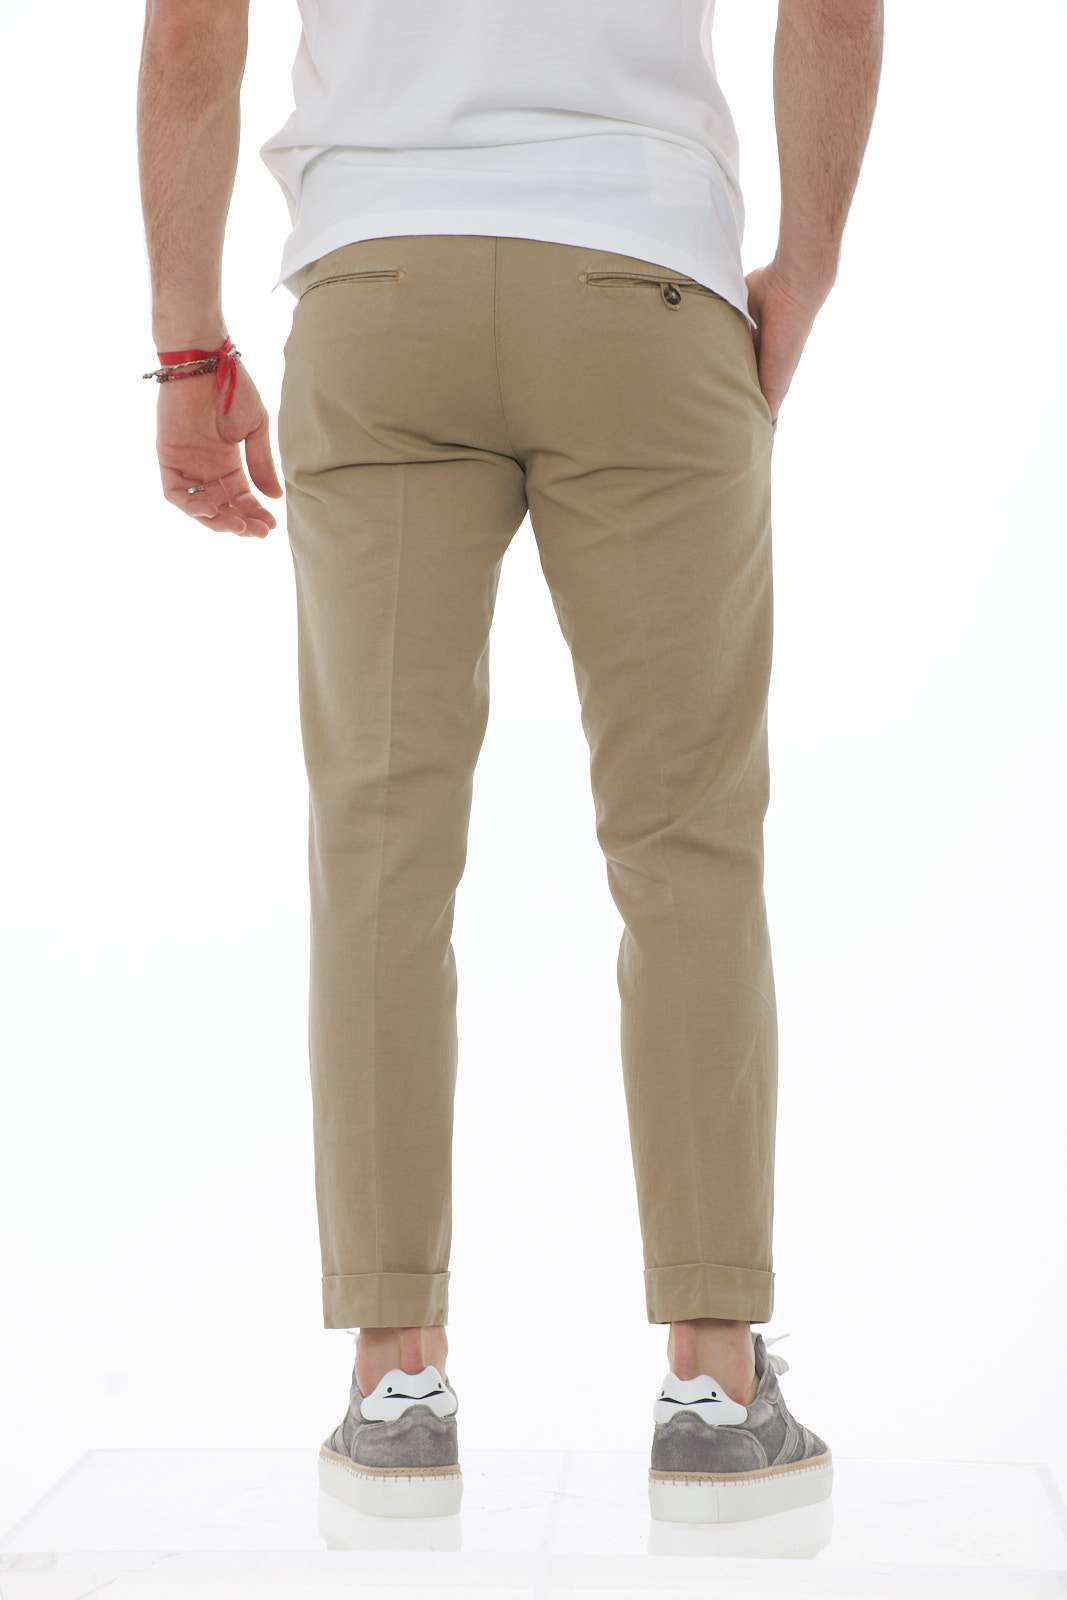 https://www.parmax.com/media/catalog/product/a/i/PE-outlet_parmax-pantaloni-uomo-FREDERICK3340-C.jpg